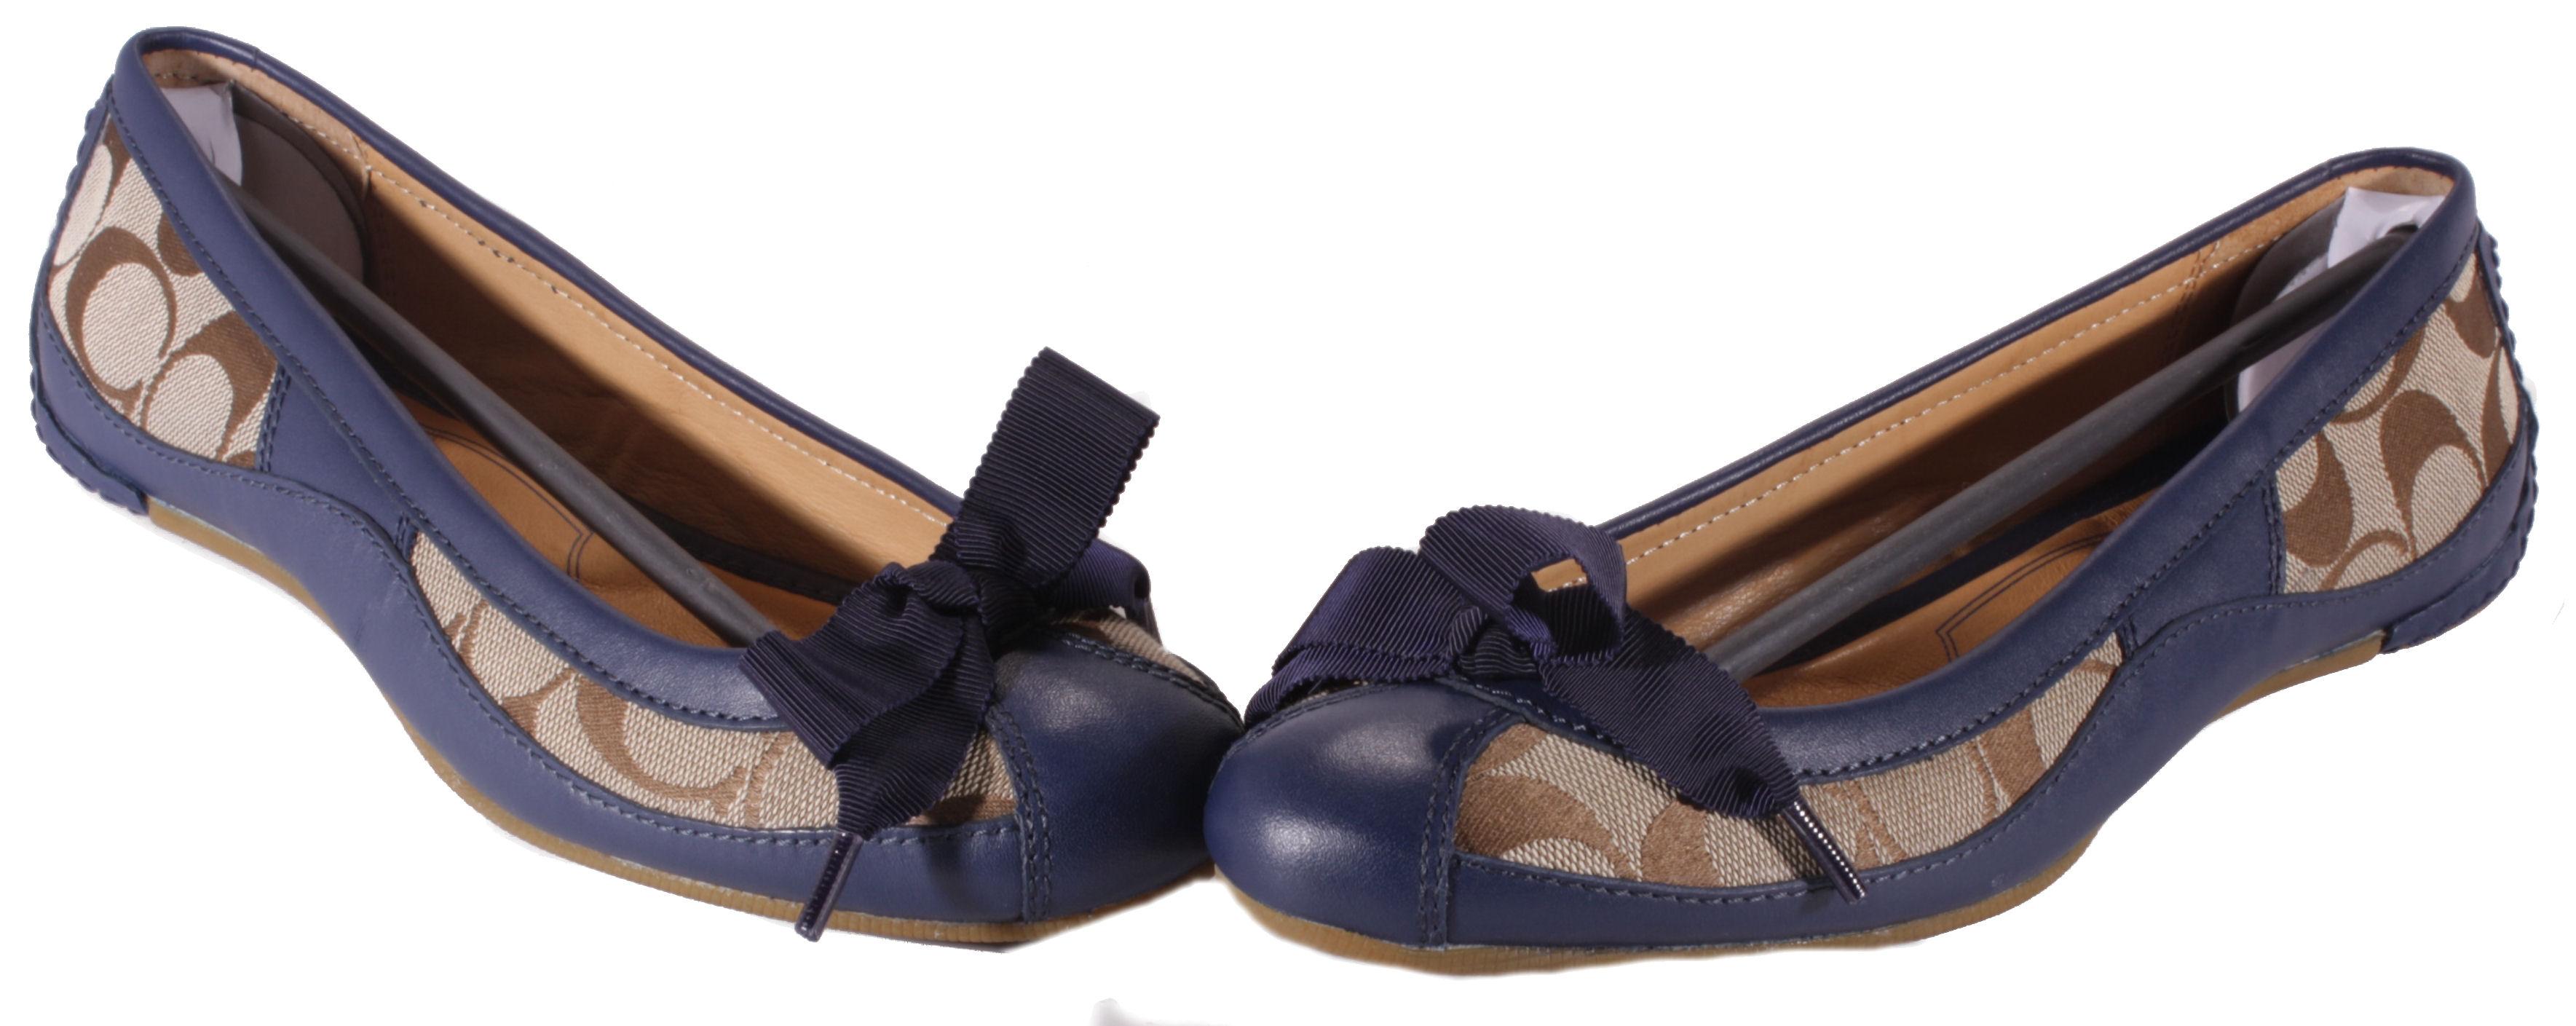 Coach Brodi 12cm Signature C Crinkle Khaki Teal Womens Sneakers Shoes